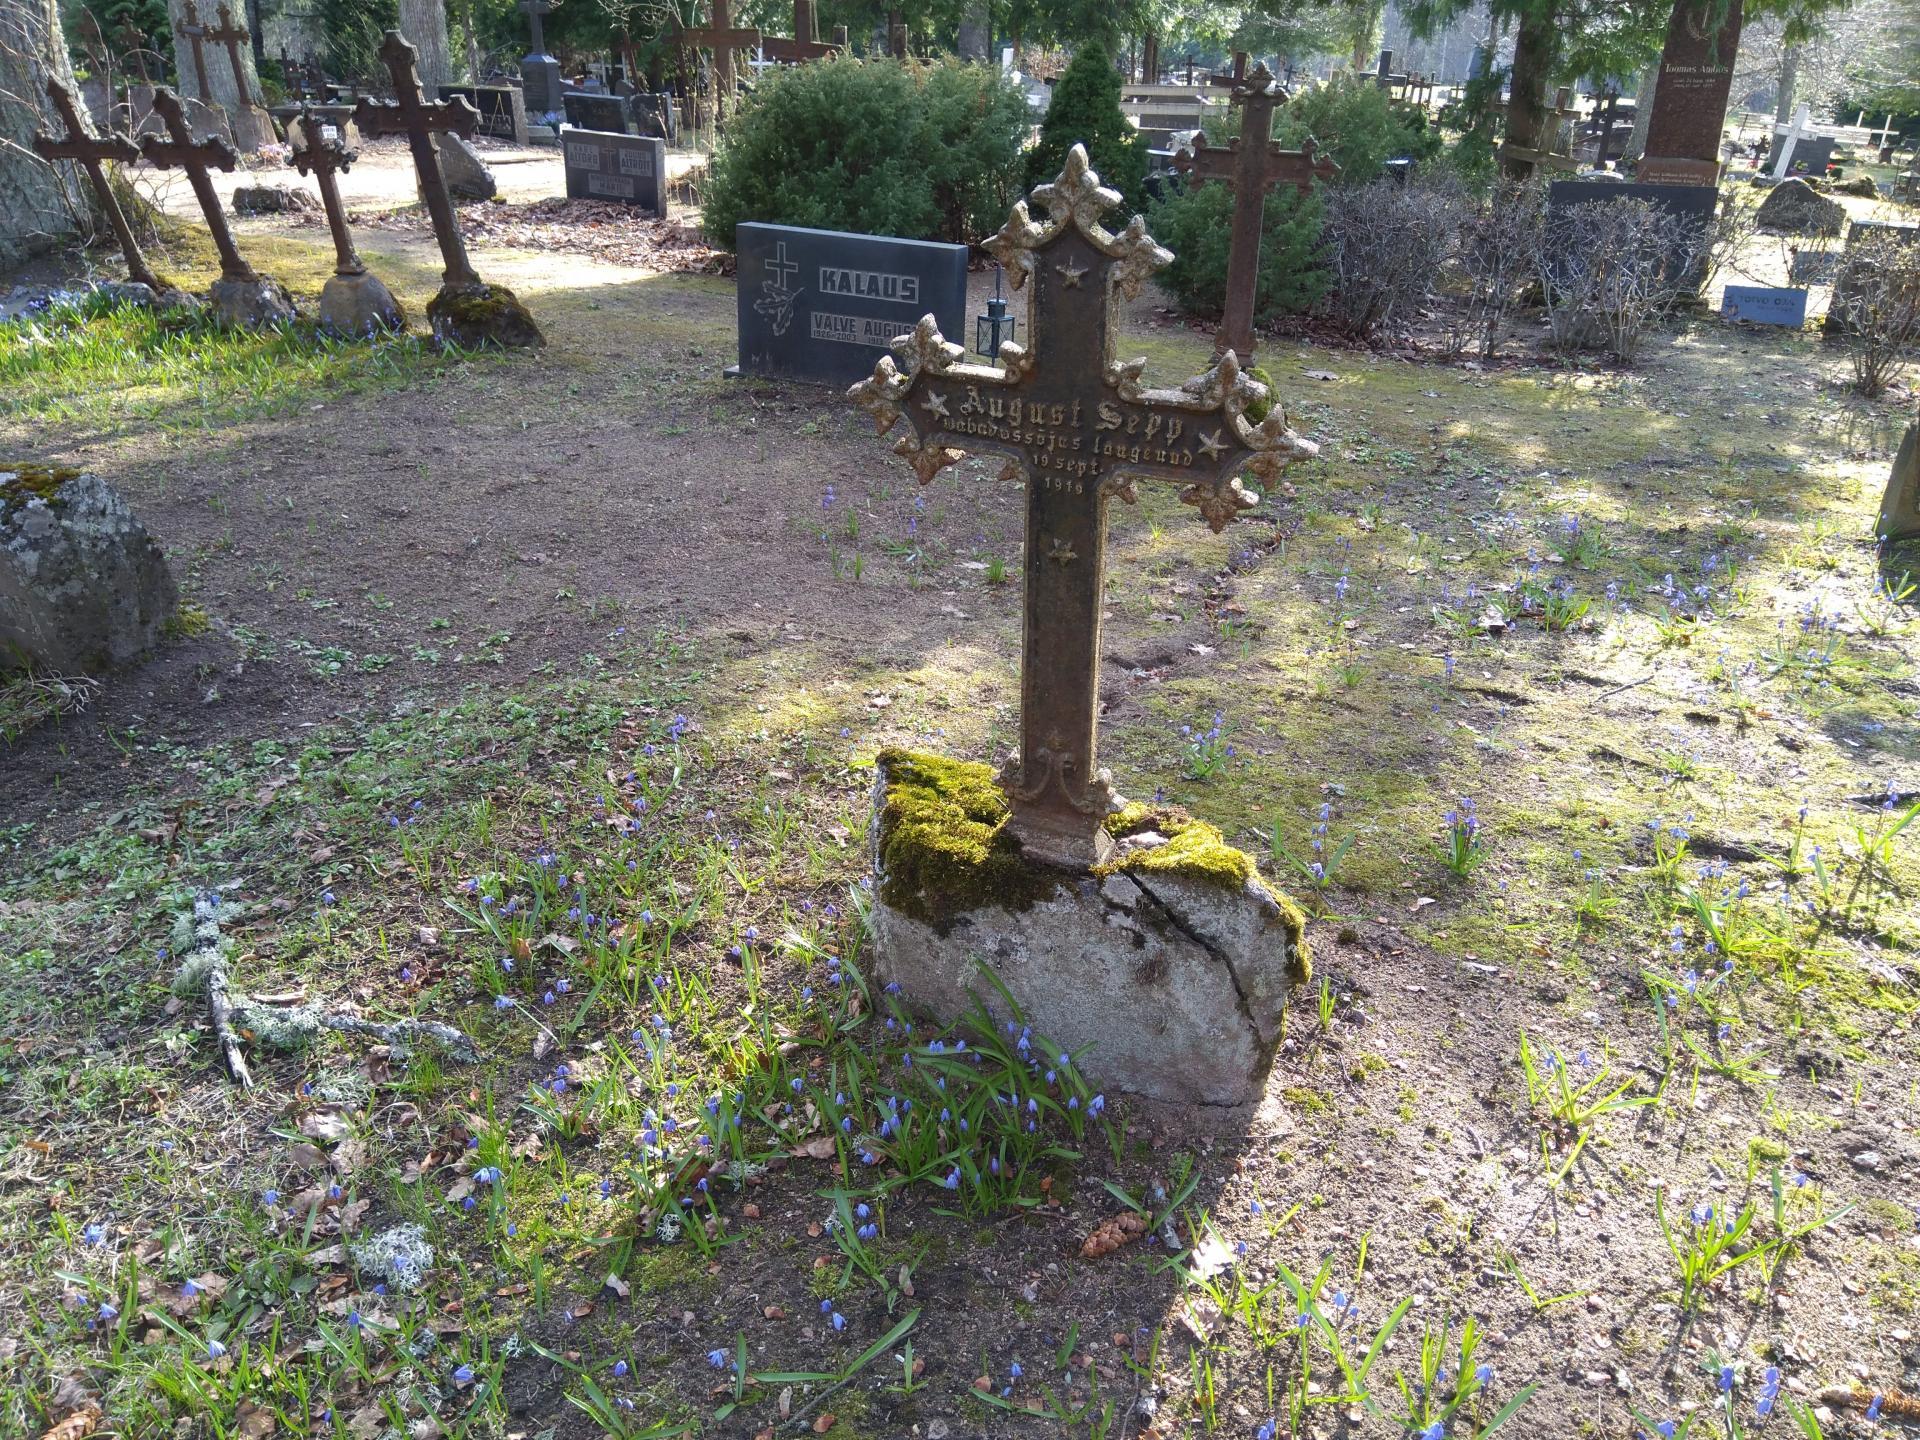 https://www.haudi.ee/uploads/burialplace_5bd2093d32991.jpg